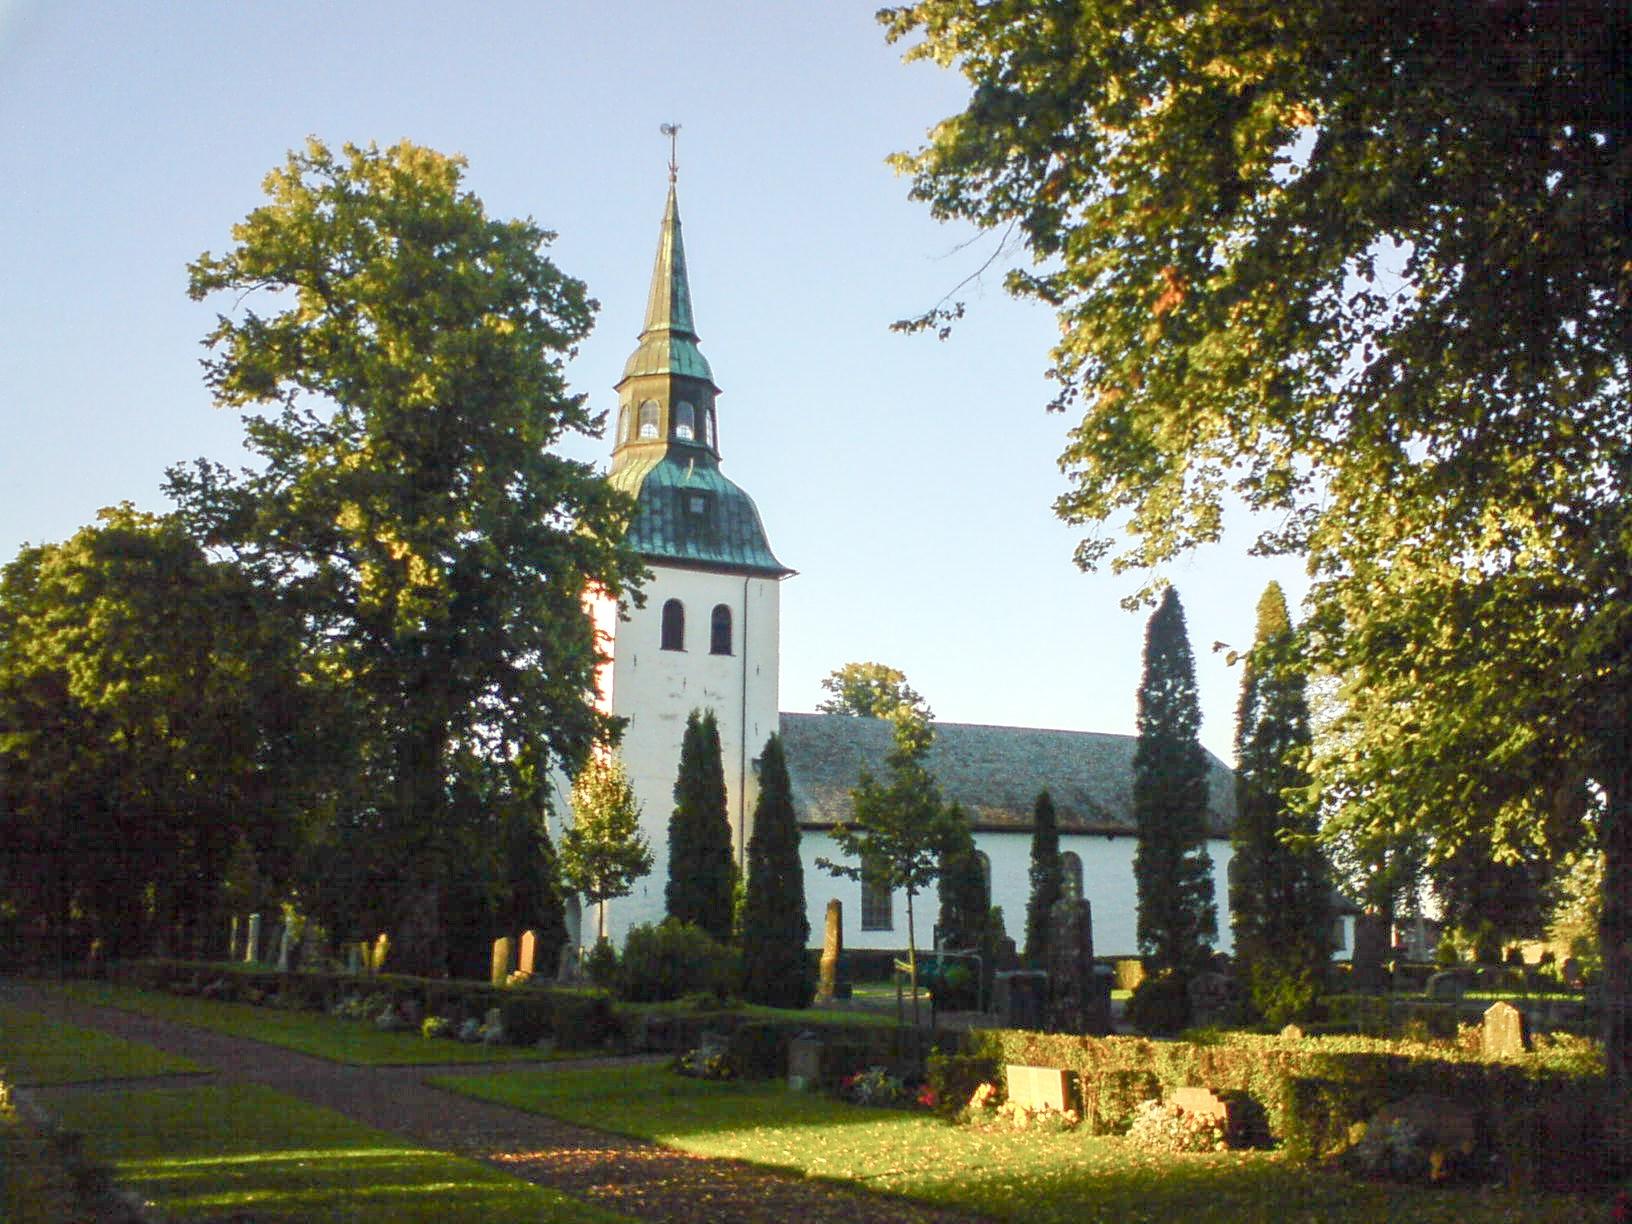 Orten Vlberg - Local Business - Vlberg | Facebook - 32